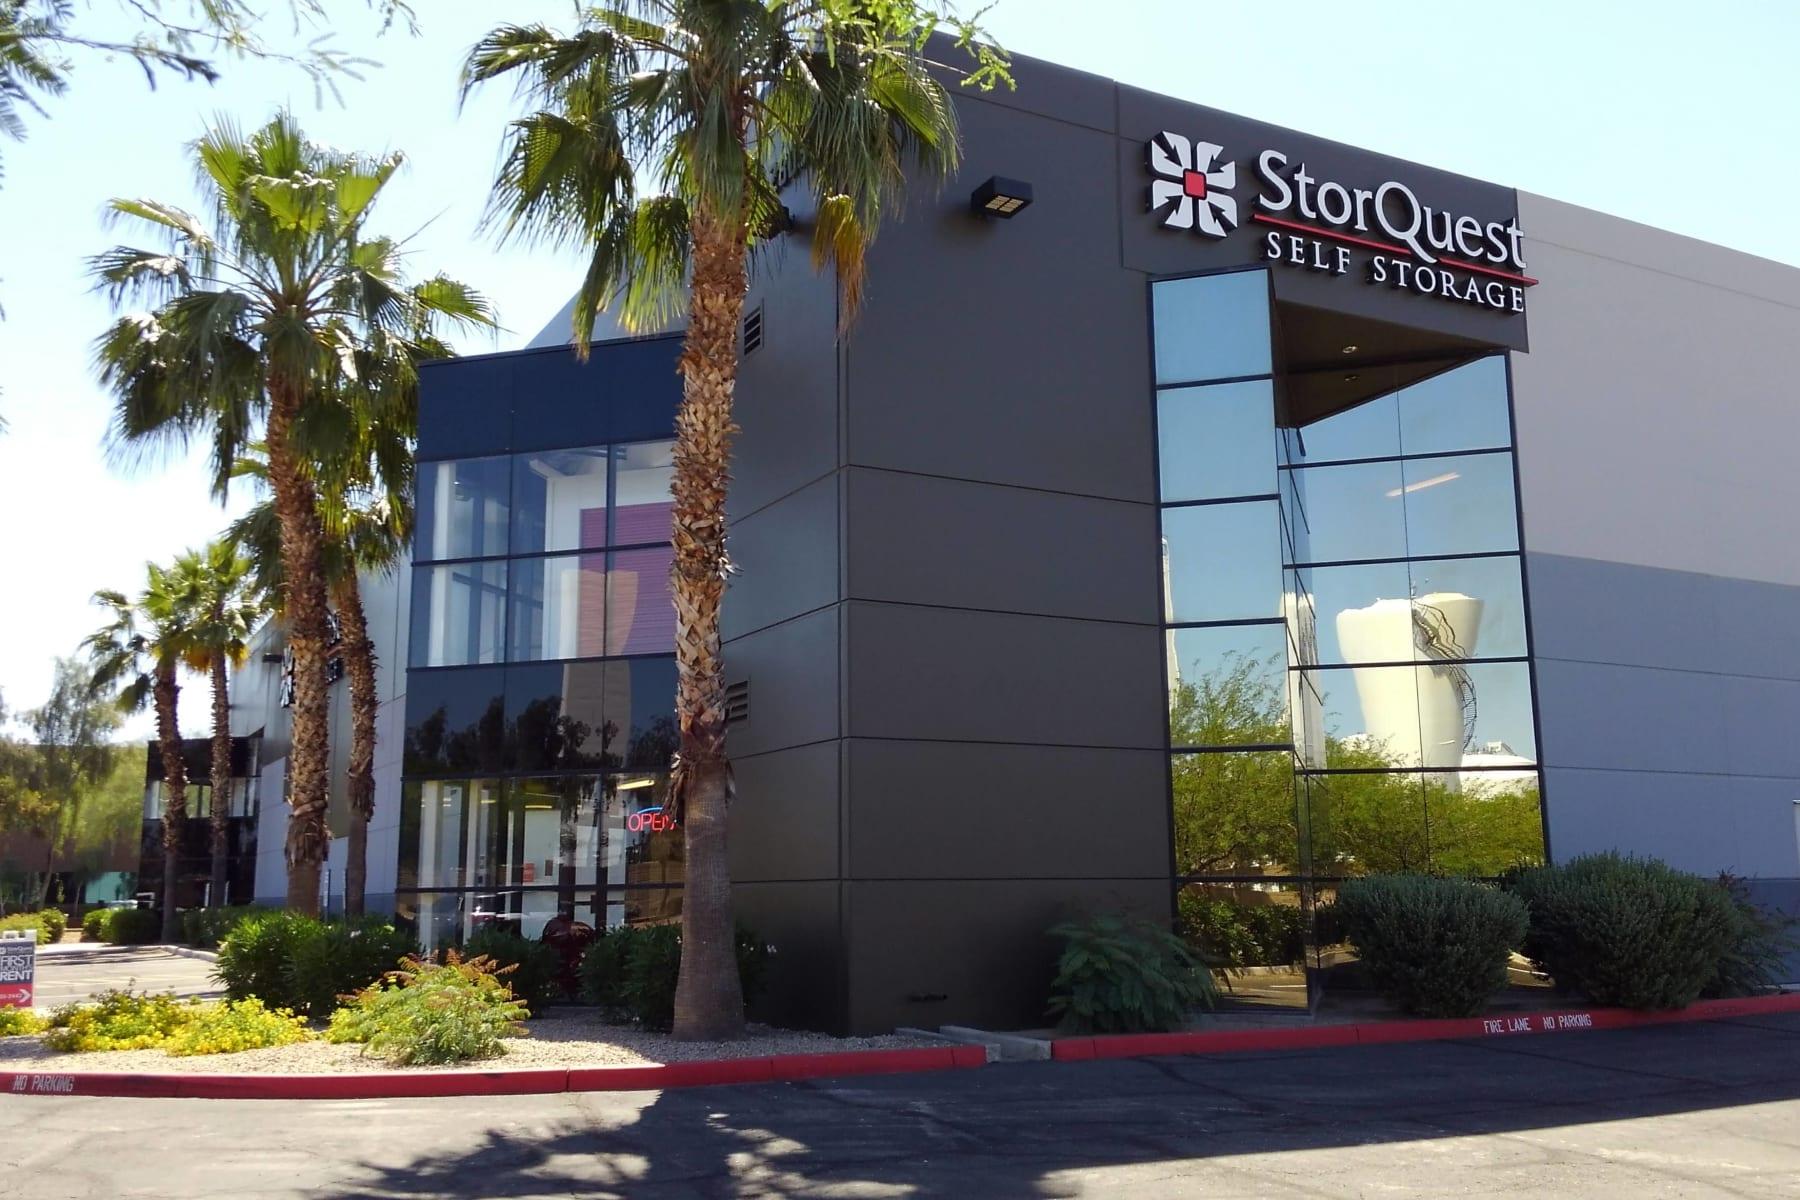 Store front at StorQuest Self Storage in Chandler, AZ